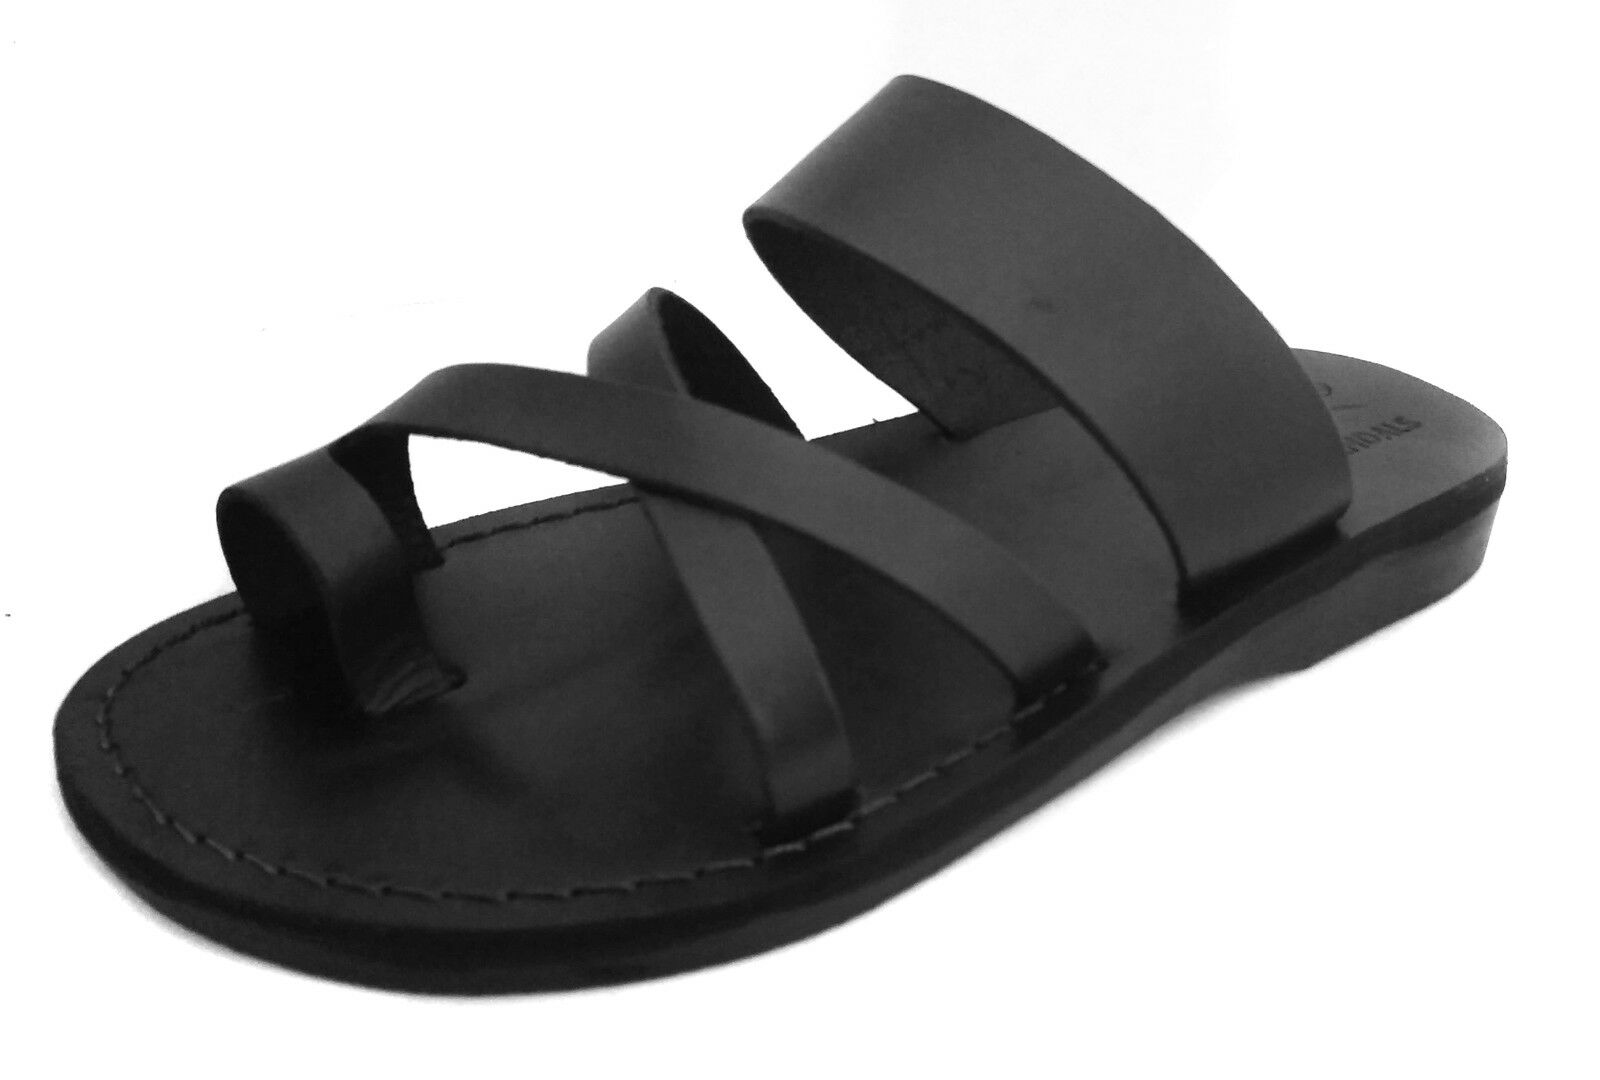 Black Leather Jesus Sandals For Men Strap Handmade Thongs UK (6-11) EU (40-46)